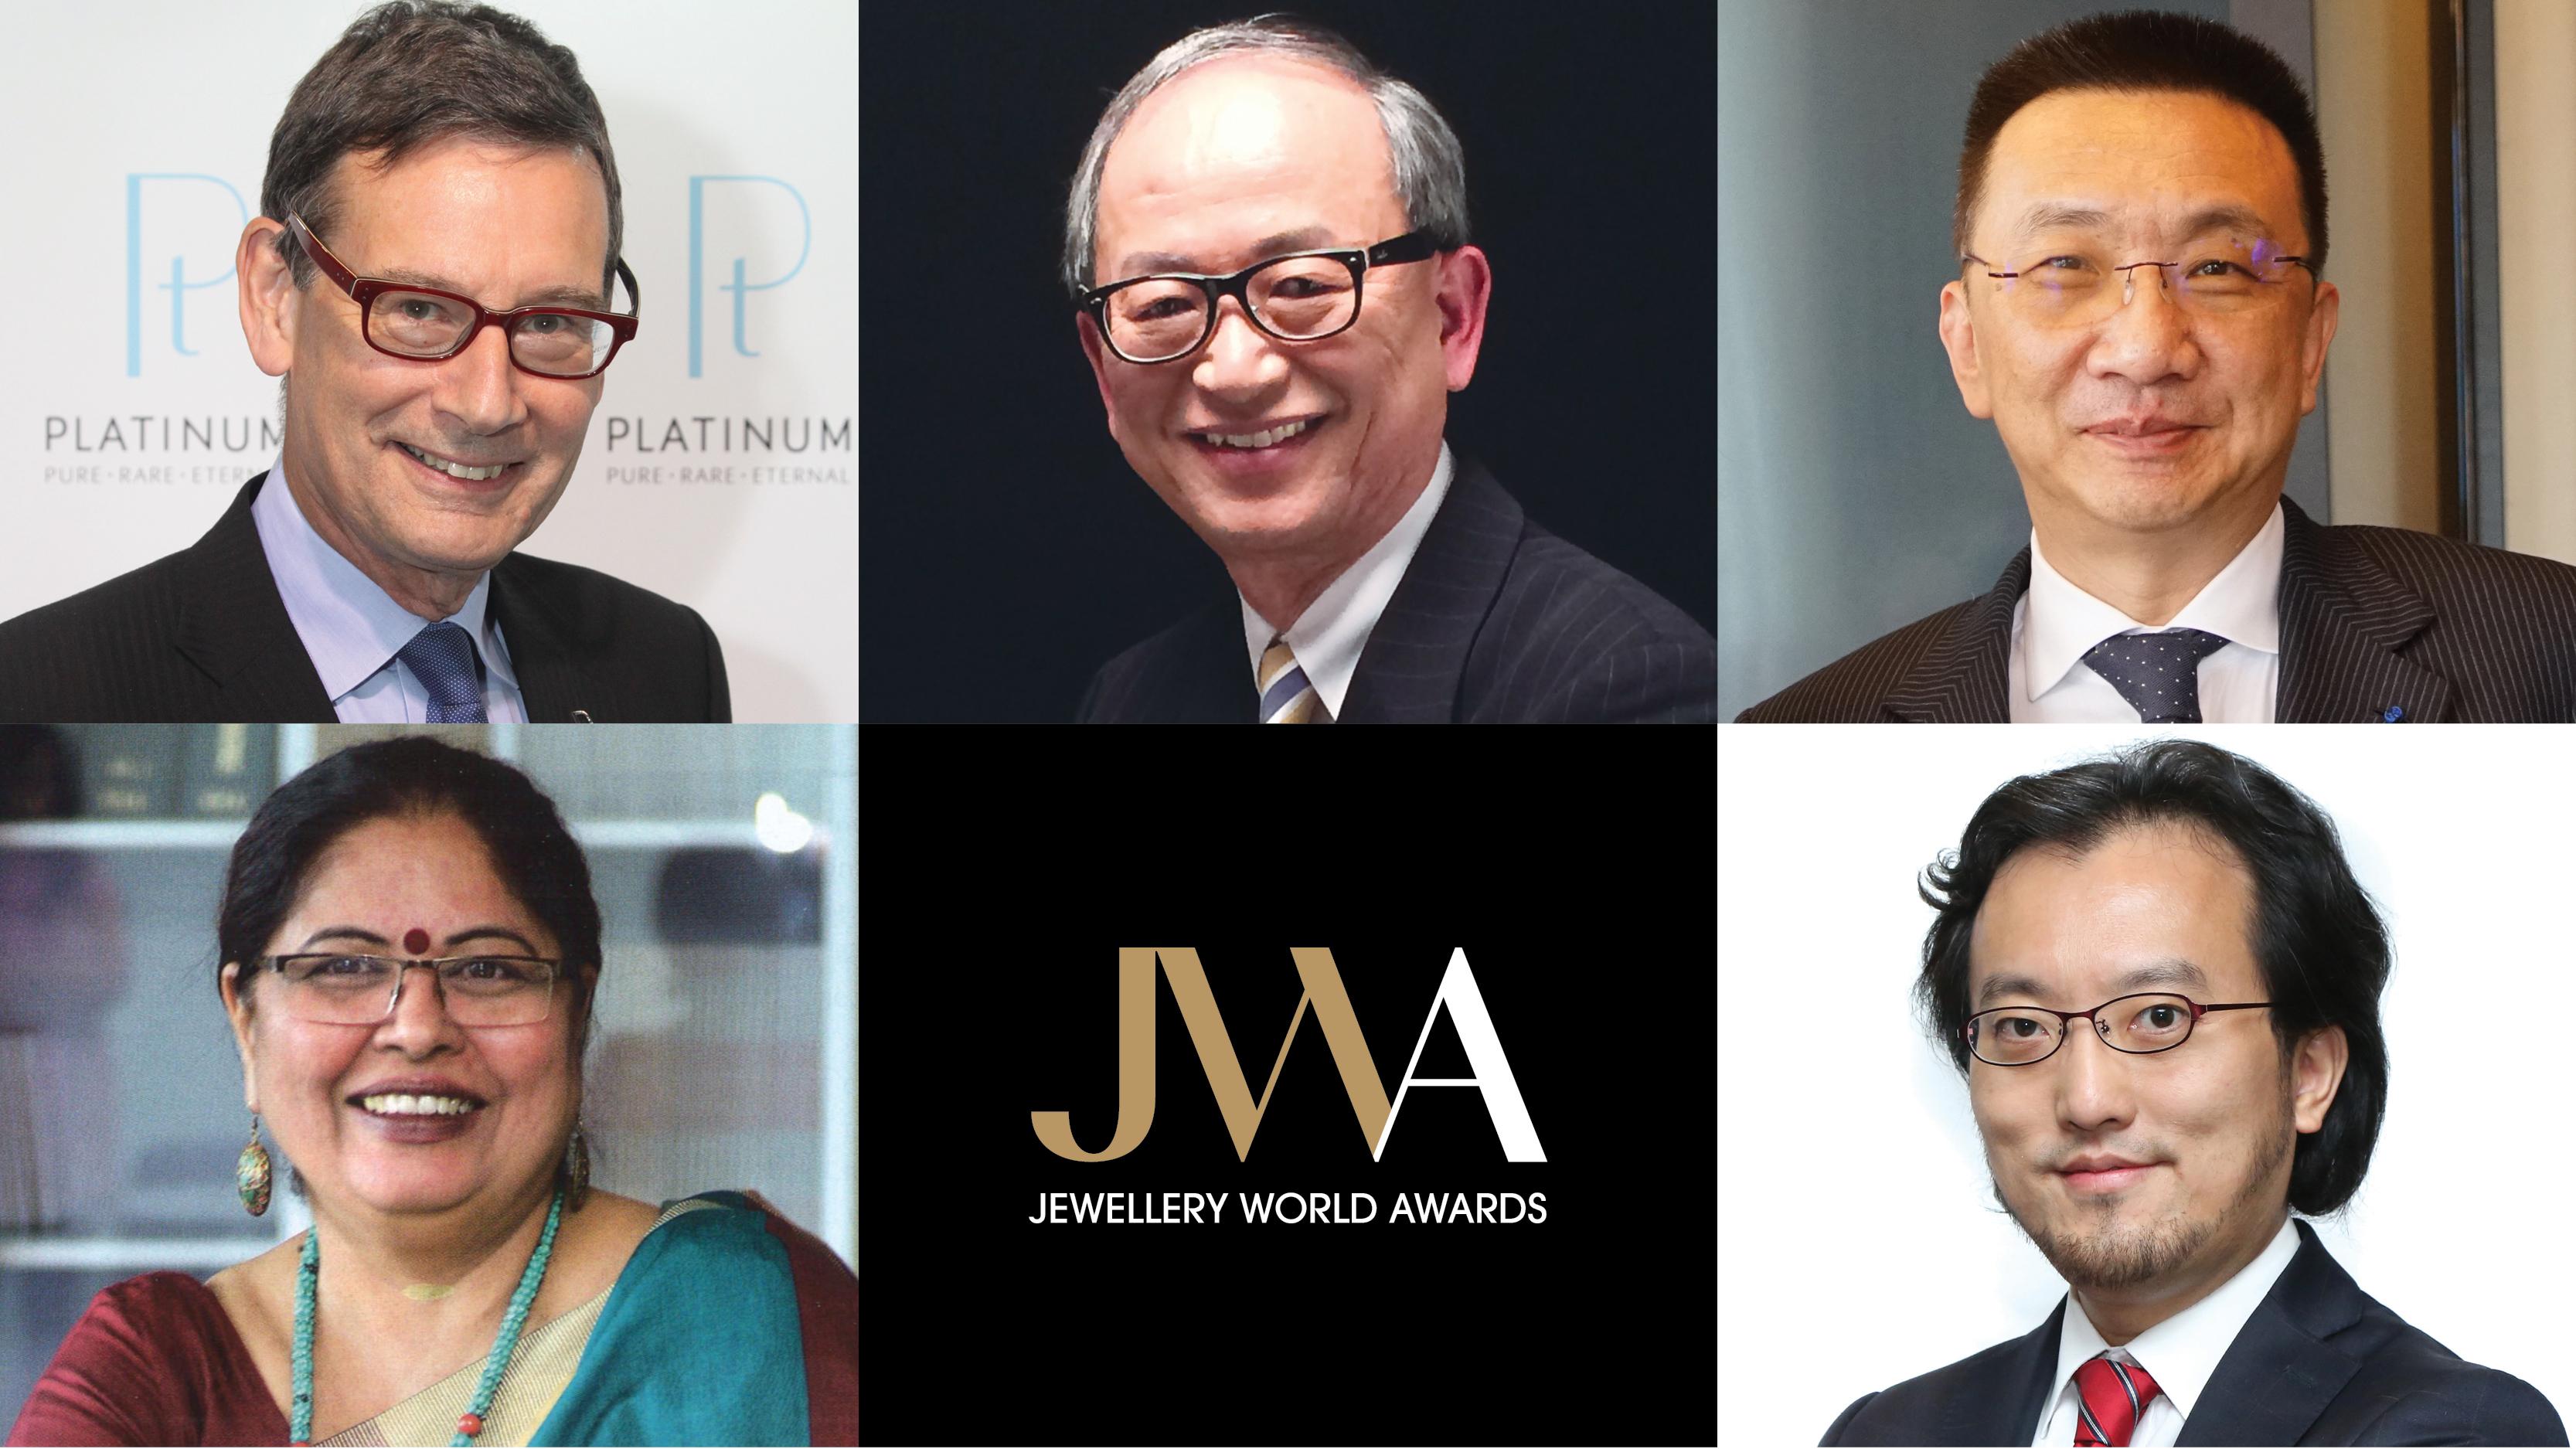 2021 Jewellery World Awards names Honourees